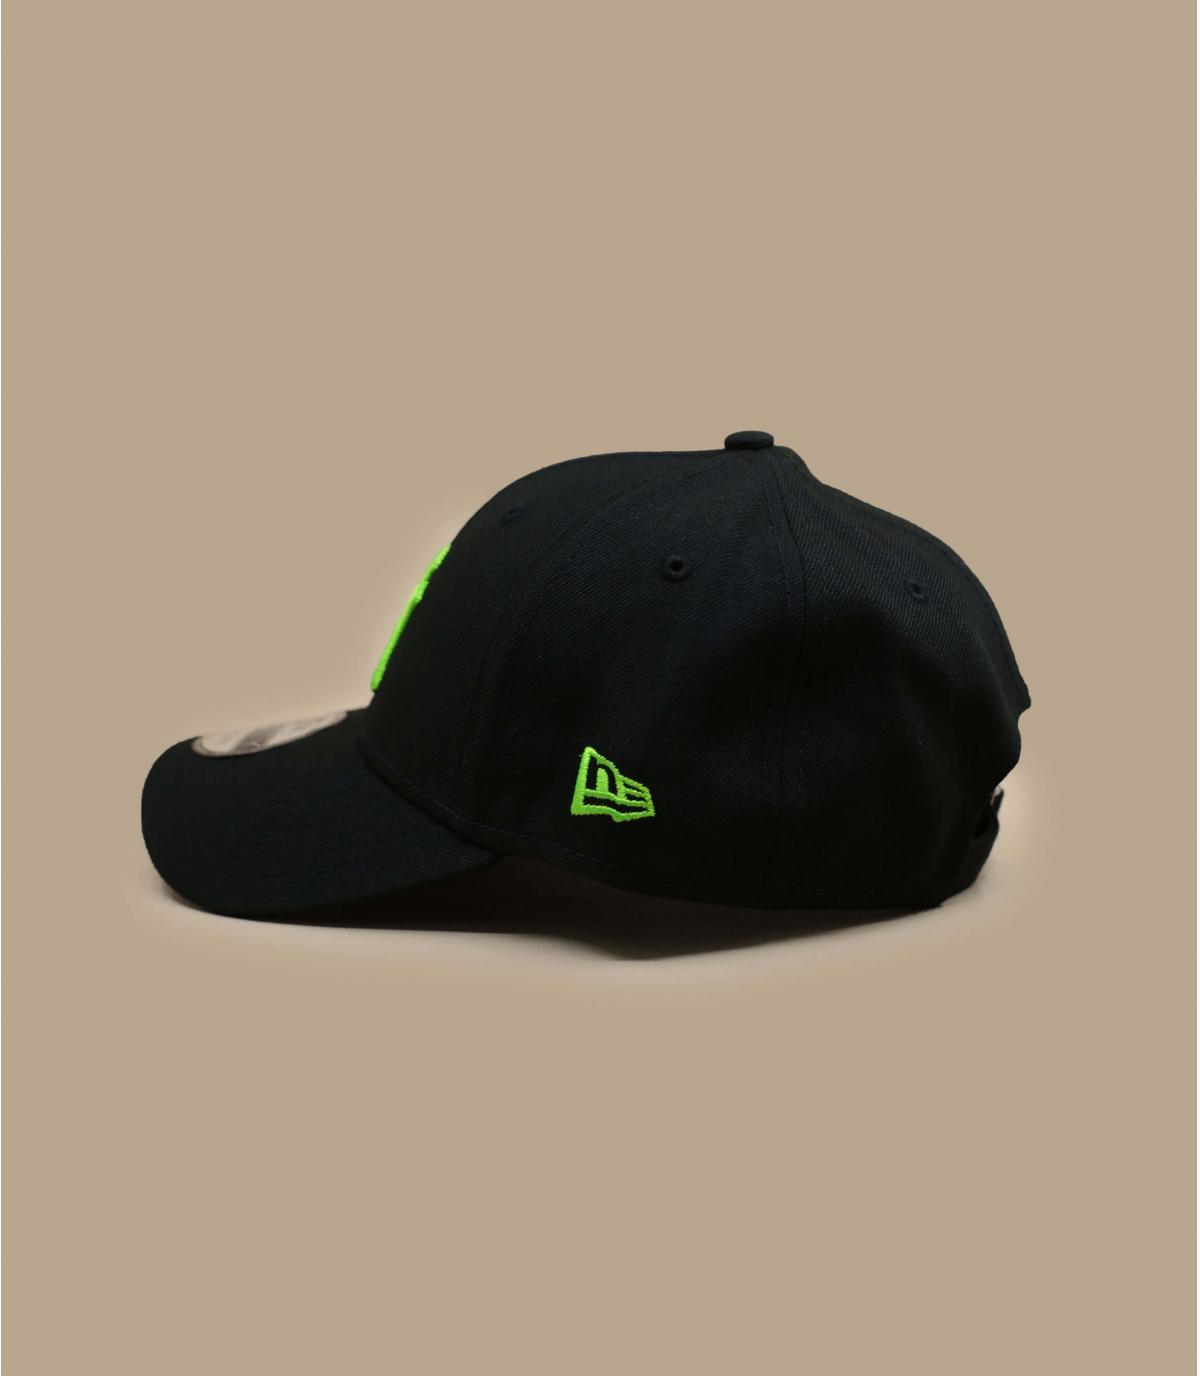 Details Neon Pack NY 940 black green - Abbildung 3